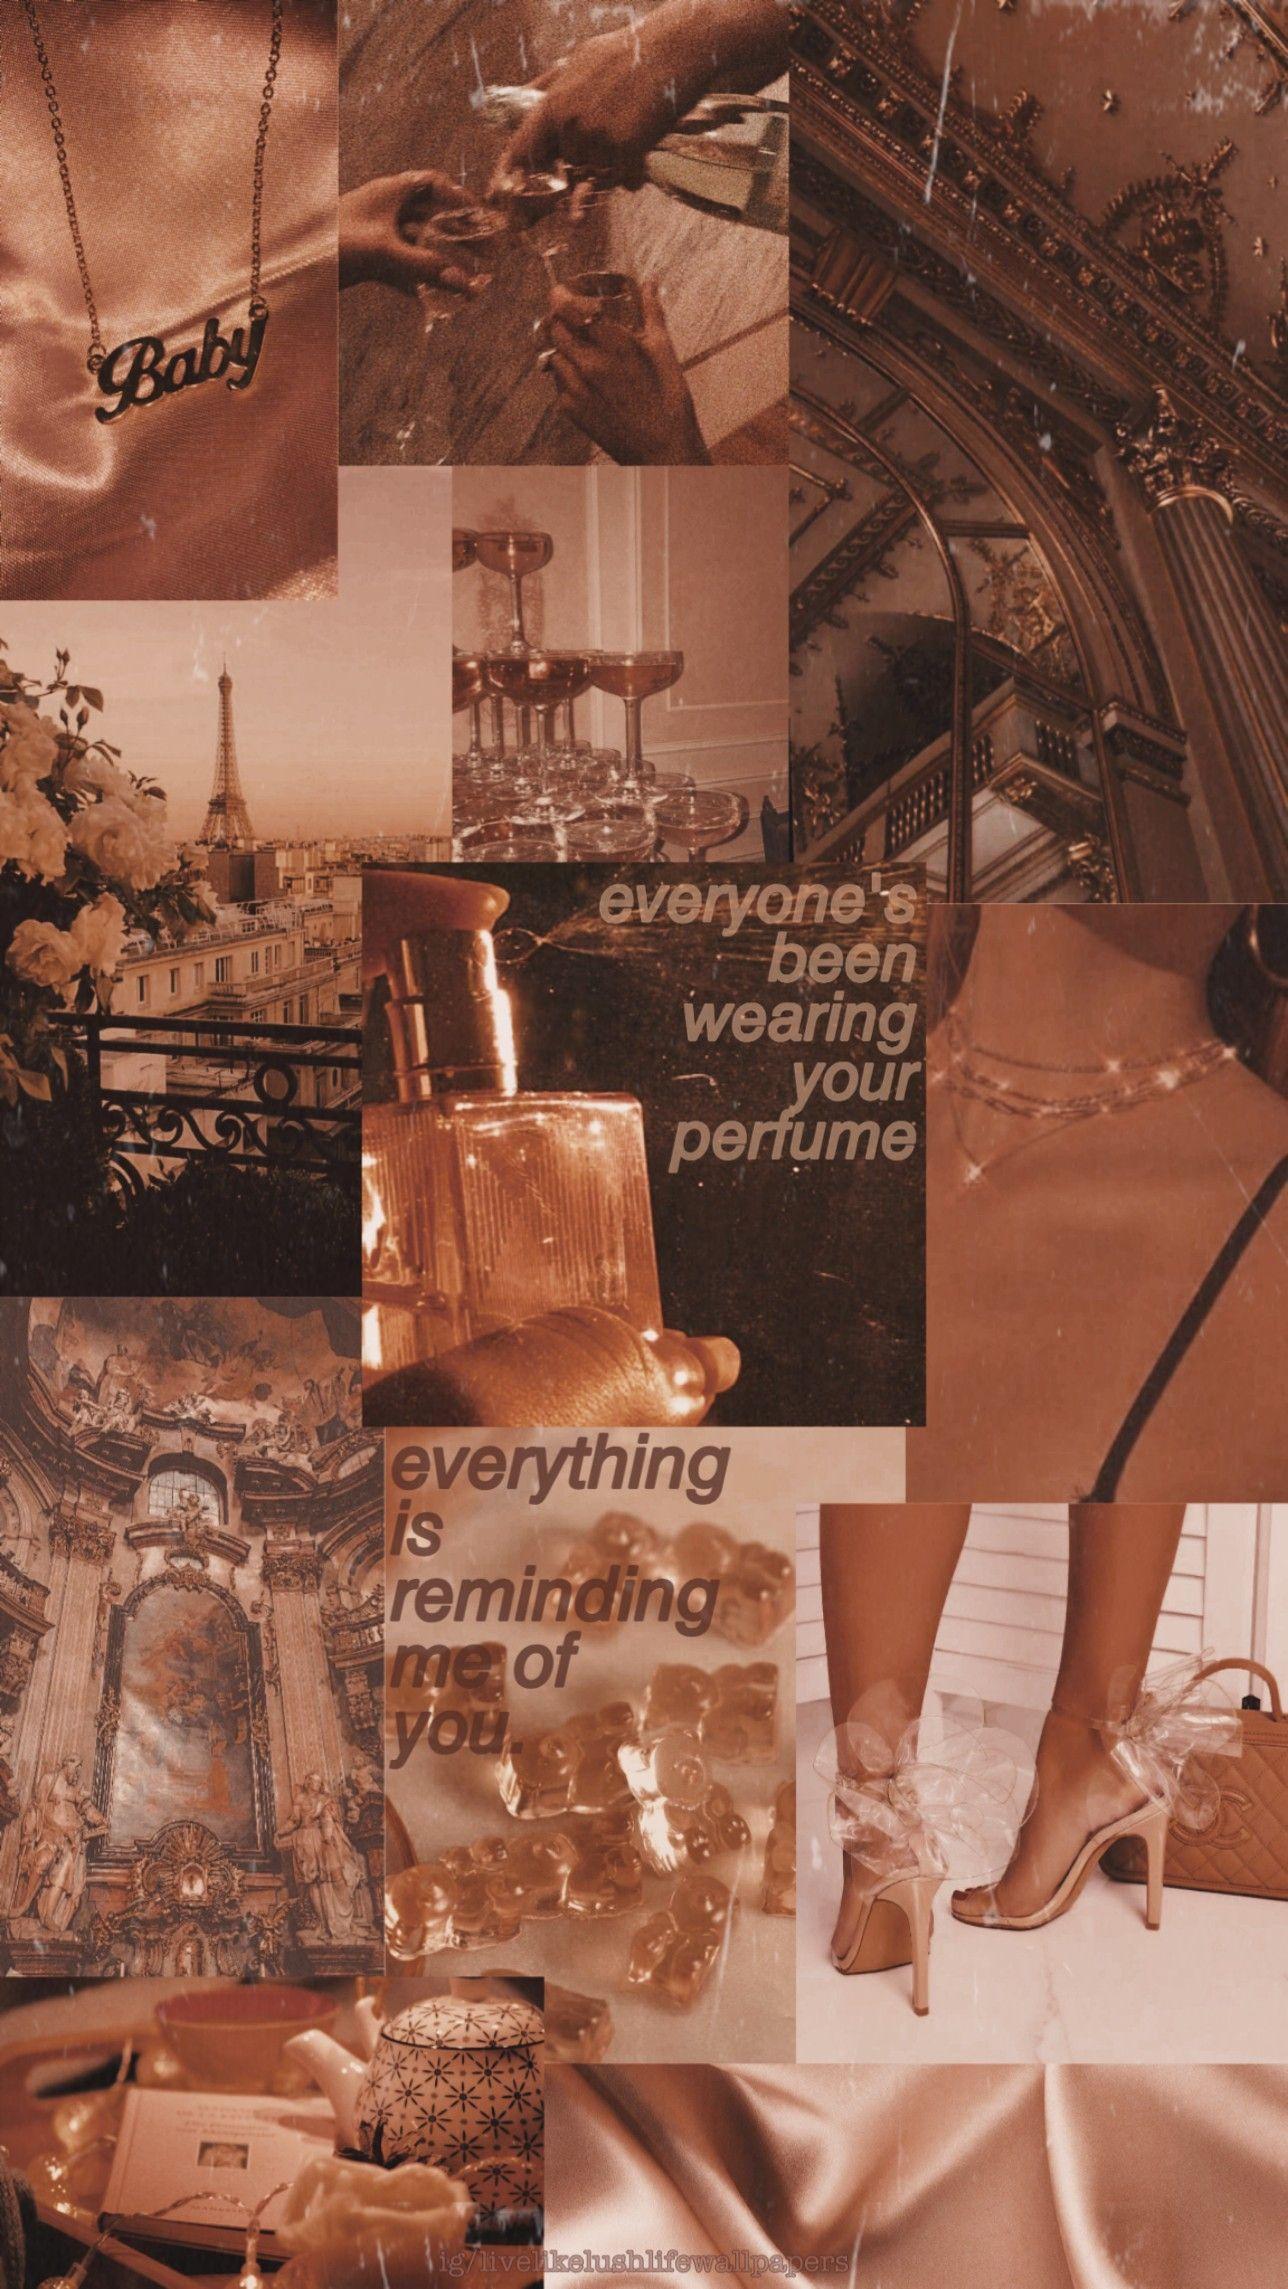 Zara Larsson Aesthetic Wallpaper